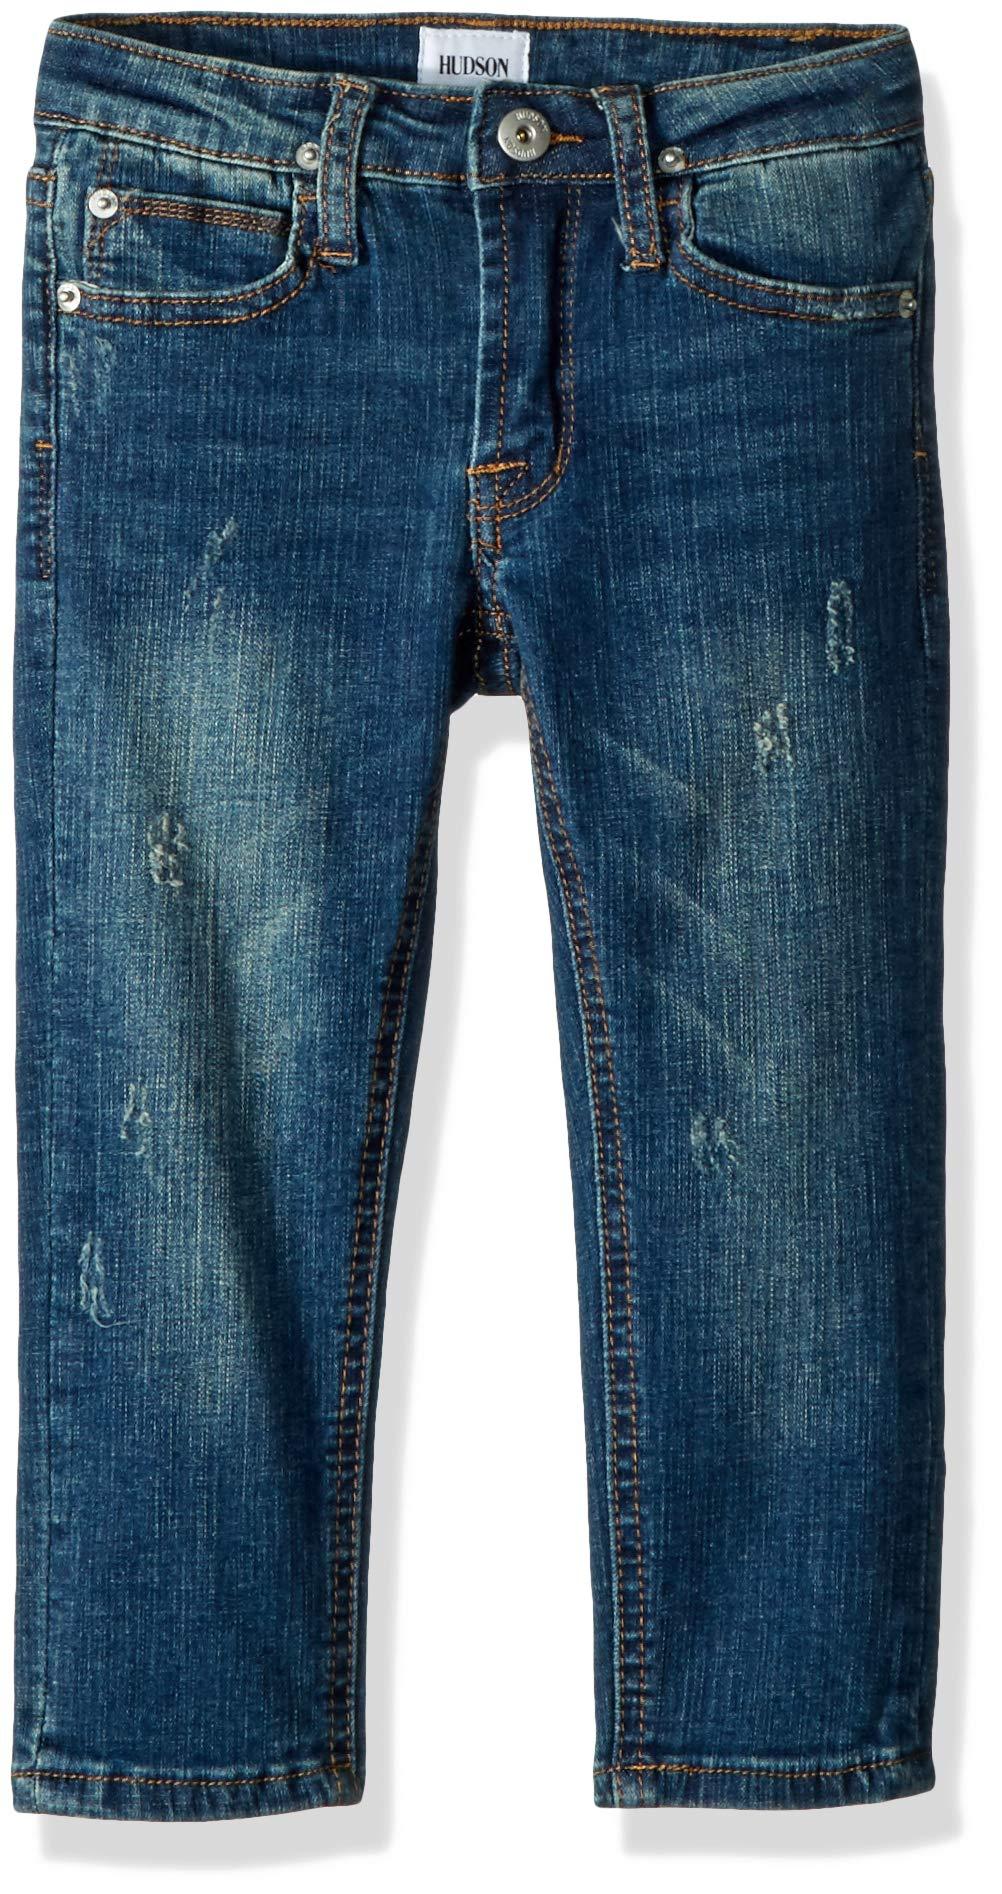 HUDSON Boys' Big Jagger Slim Straight Jean, Seven/Two Blue, 8